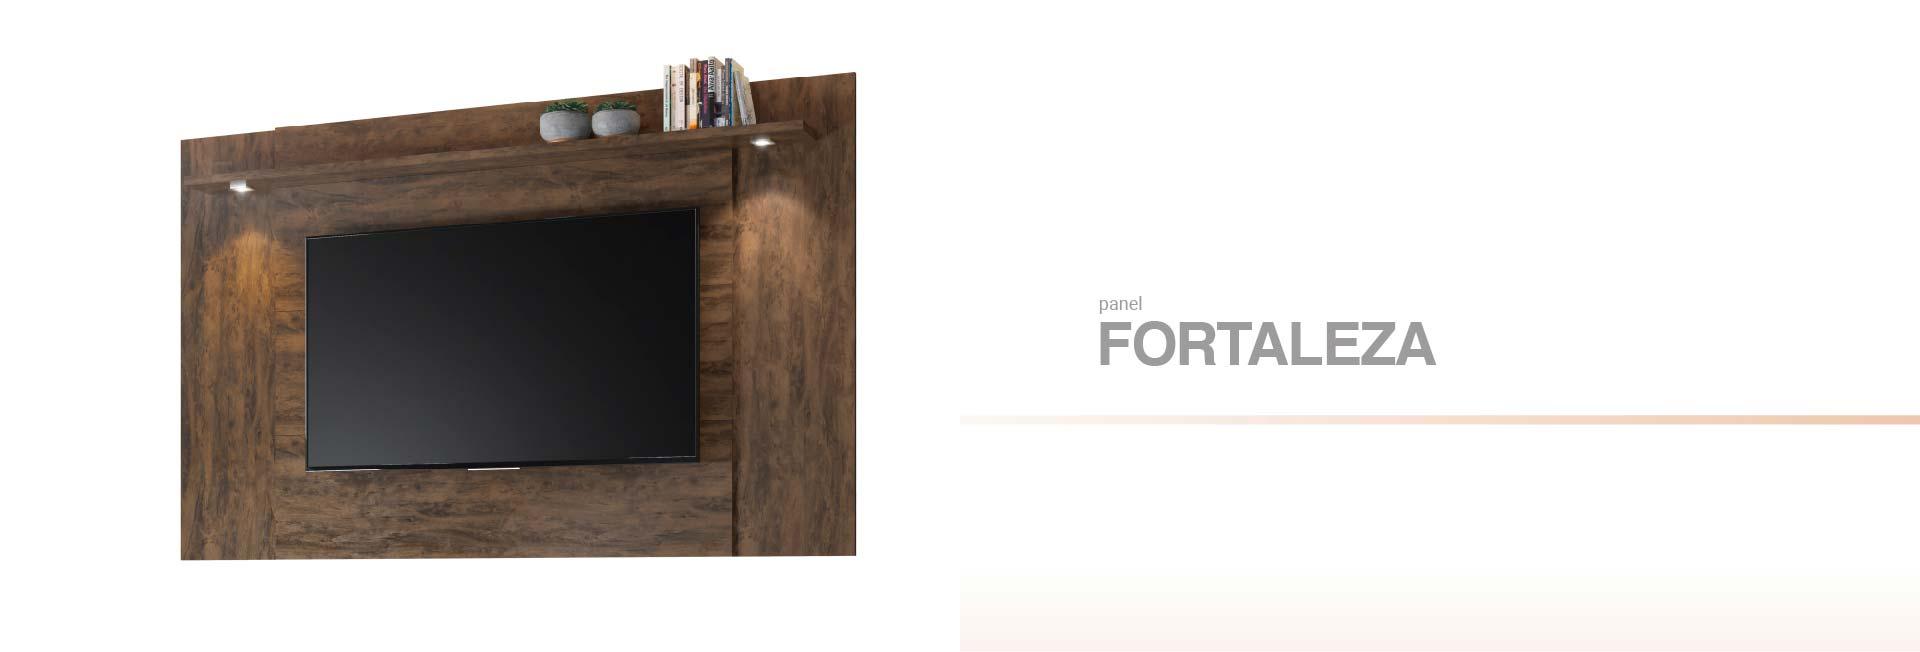 Panel Fortaleza